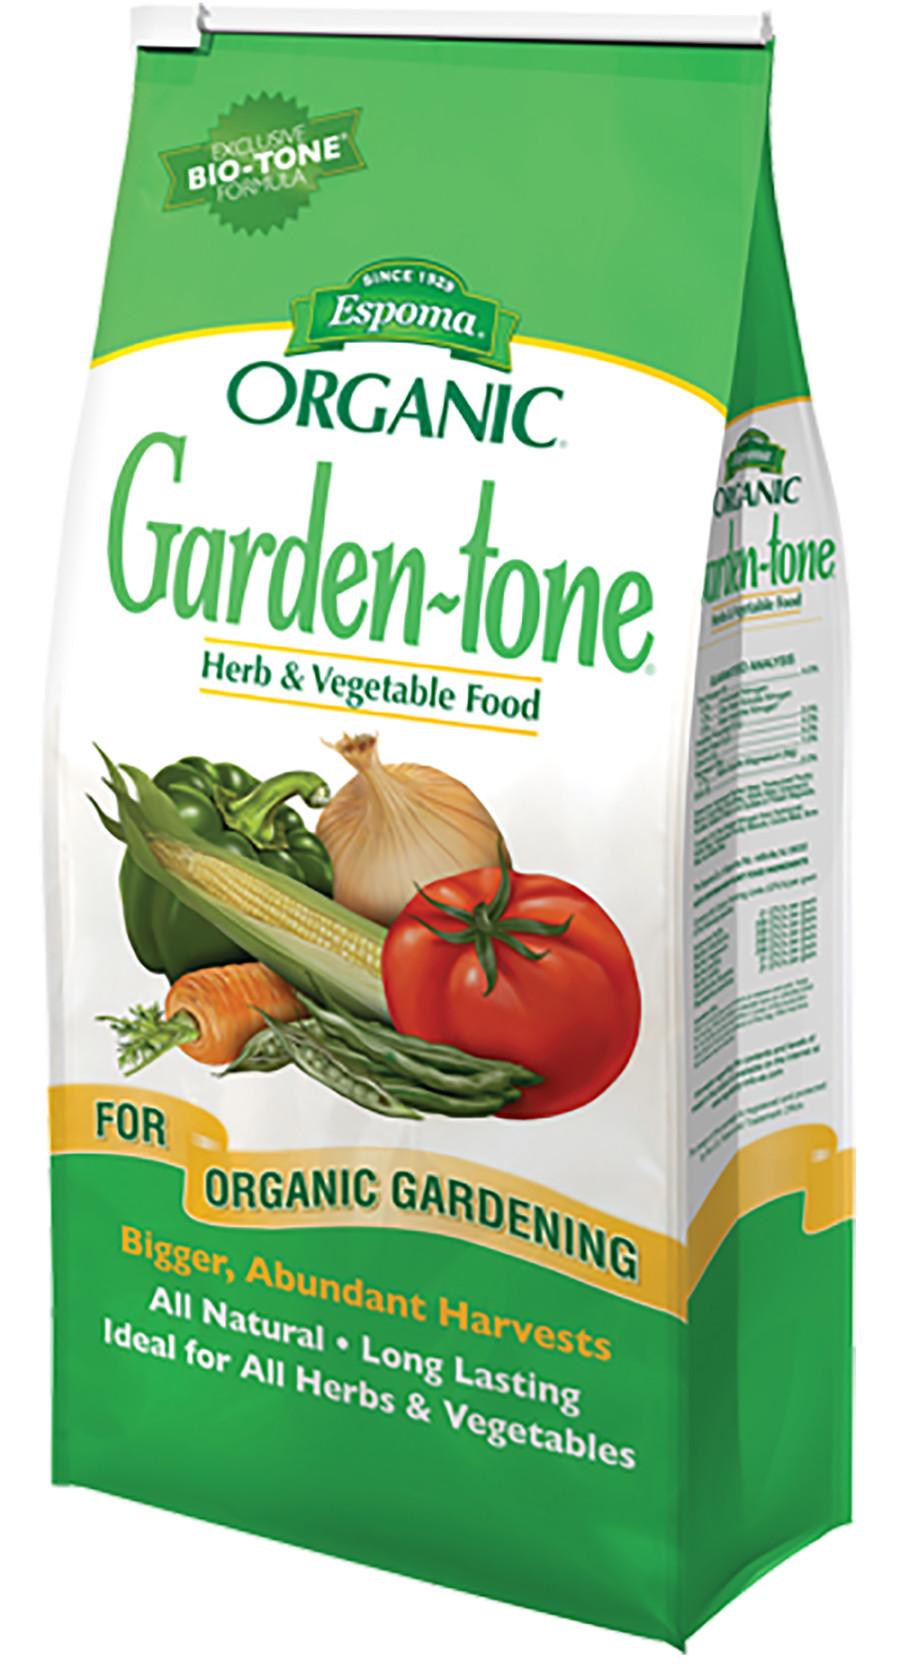 Espoma Organic Garden-tone Herb & Vegetable Food 3-4-4